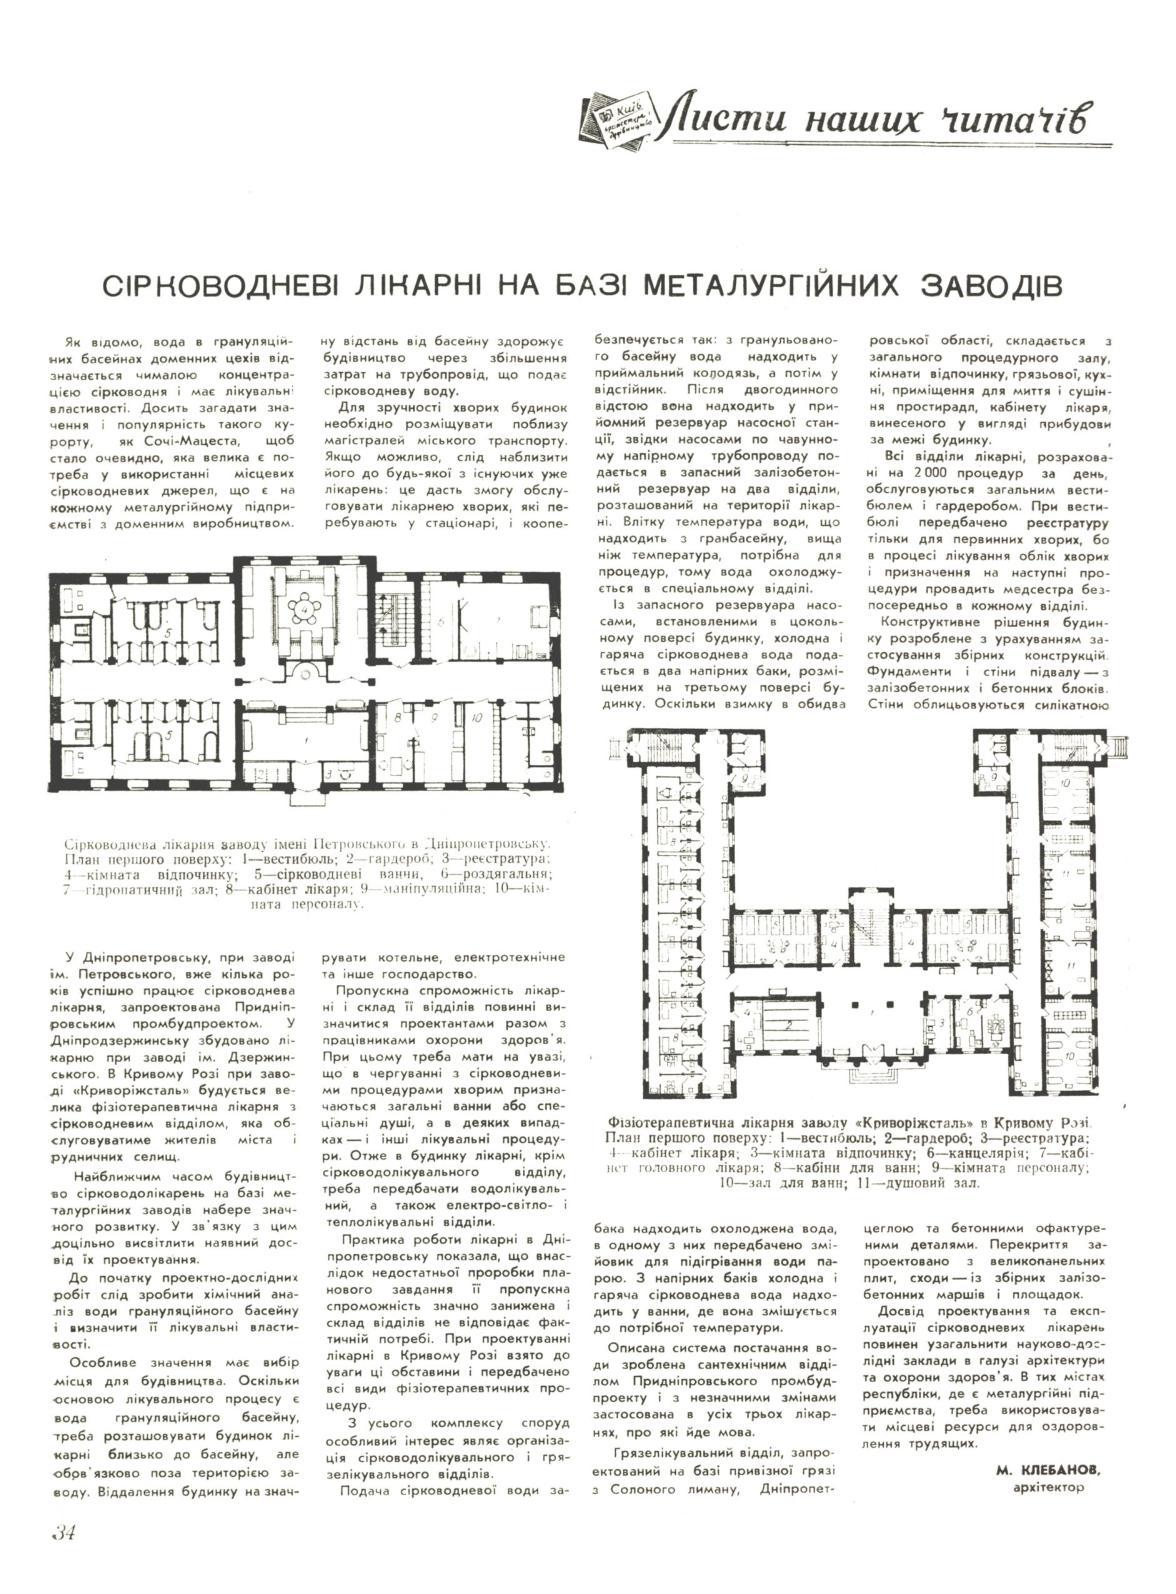 Будівництво і архітектура 1957 (12) - CALAMEO Downloader 0f675be8f330c